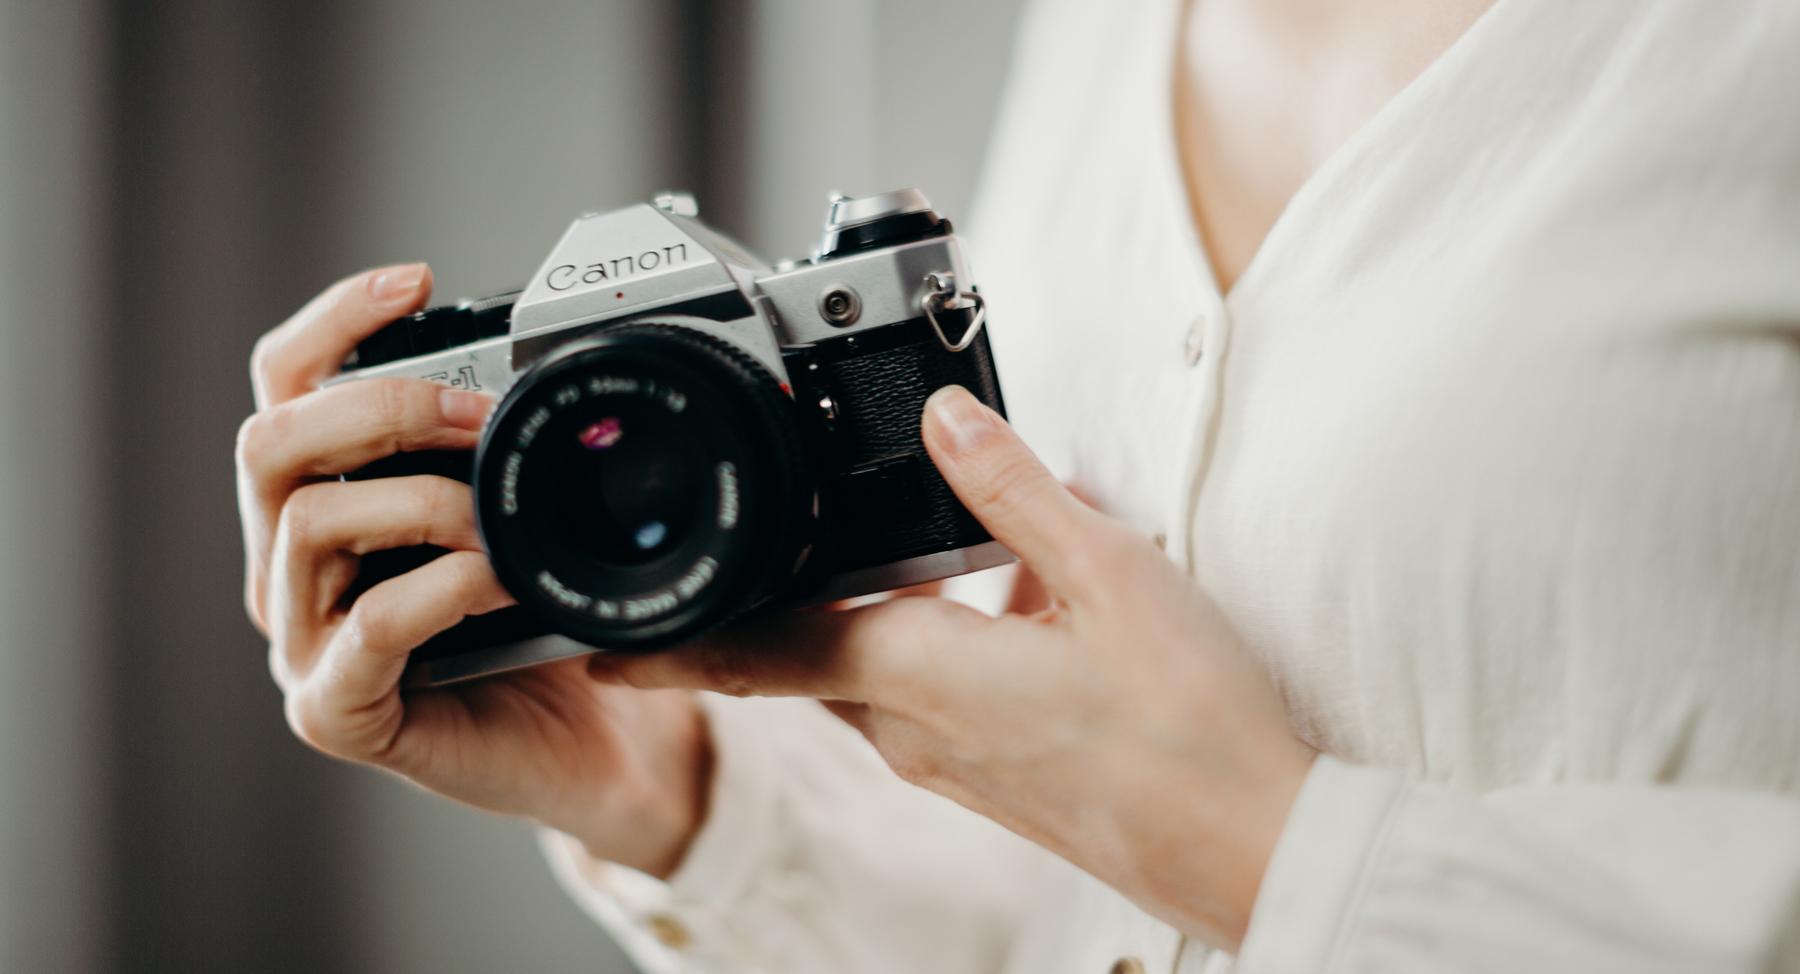 Canon AE-1 (Pic: Cottonbro/Pexels)